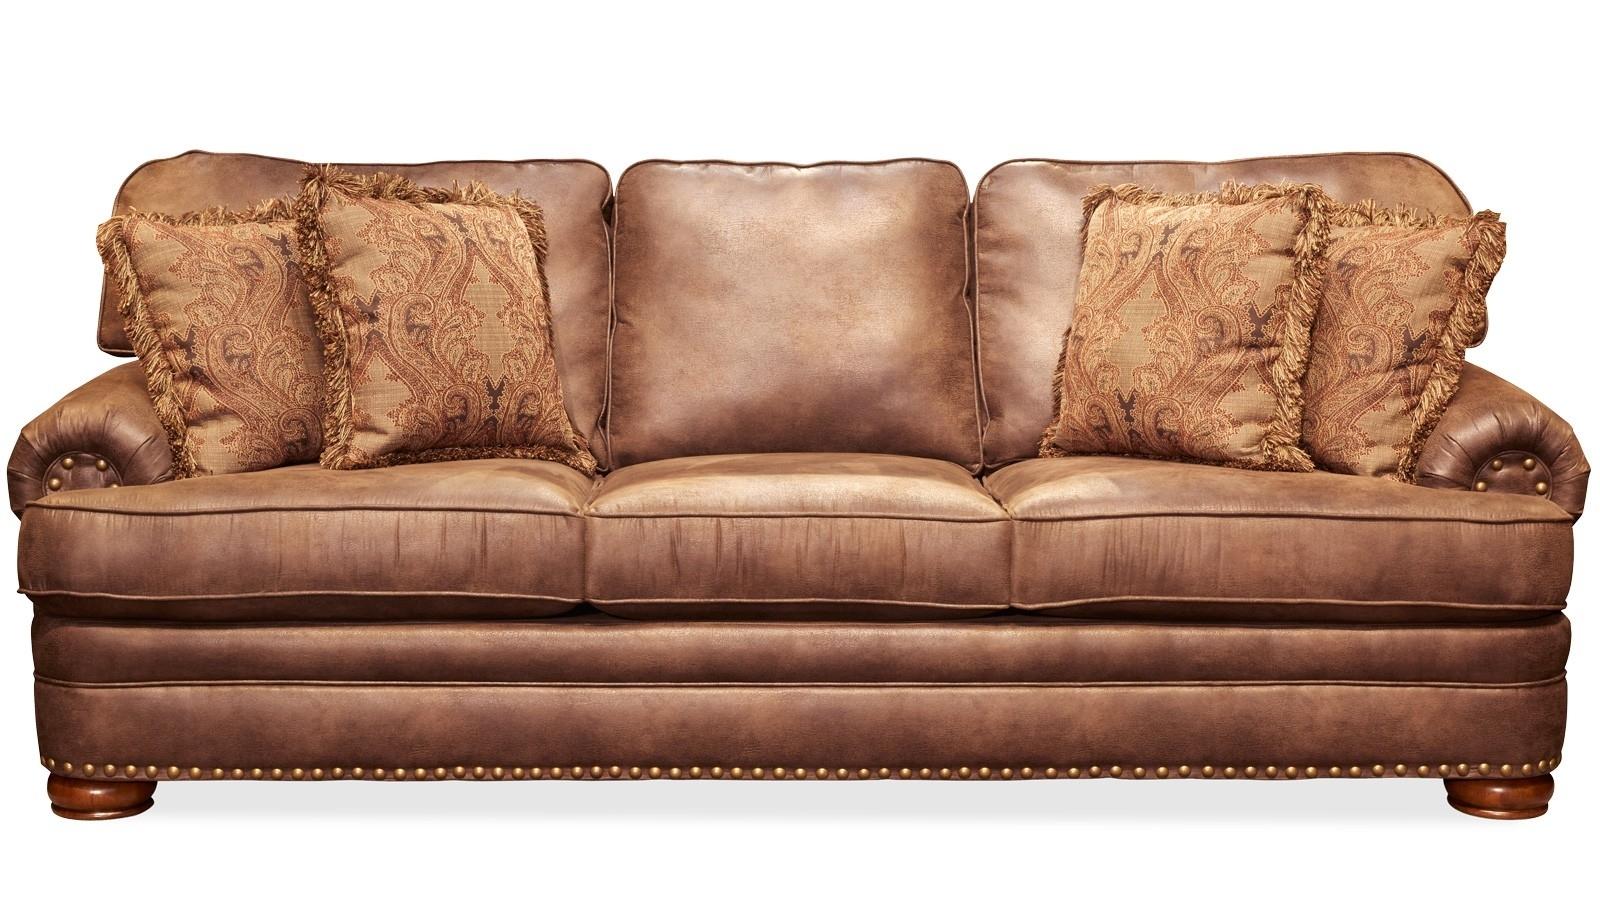 El Paso Sofa | Gallery Furniture In El Paso Sectional Sofas (View 9 of 10)